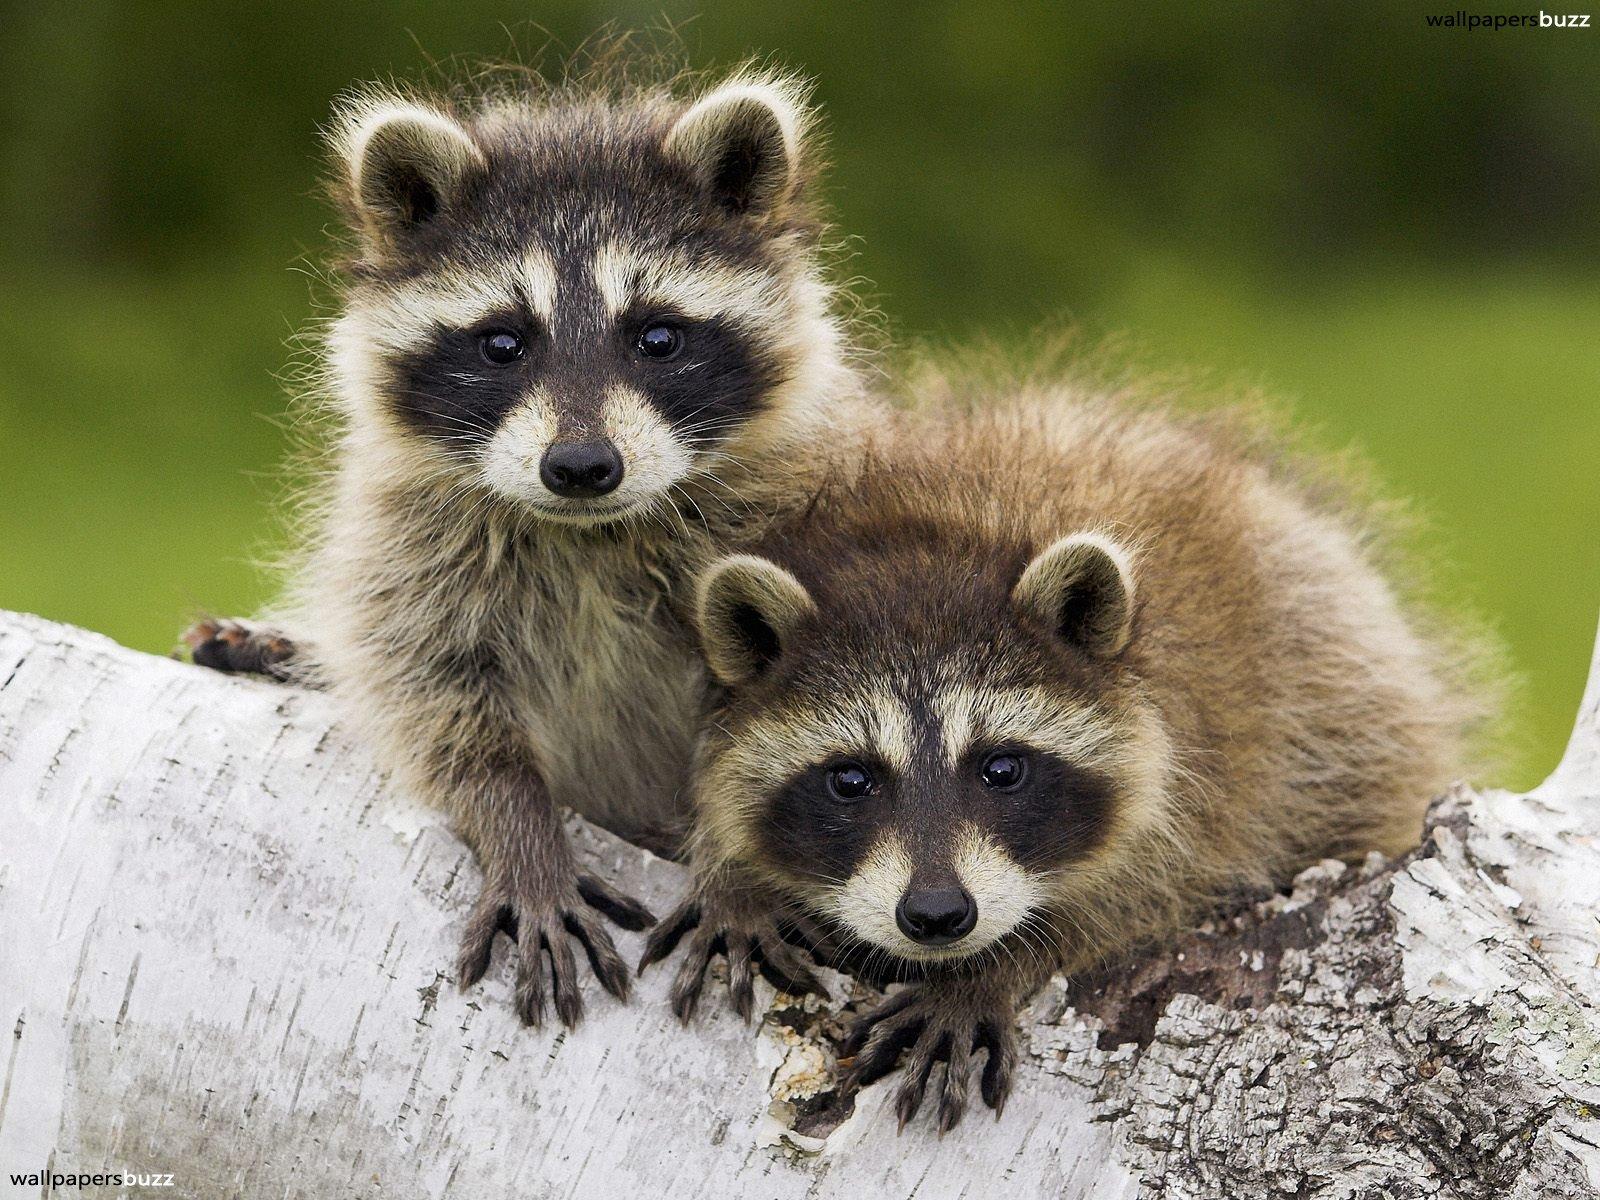 Raccoon T Funny Animals: Cute Ra...